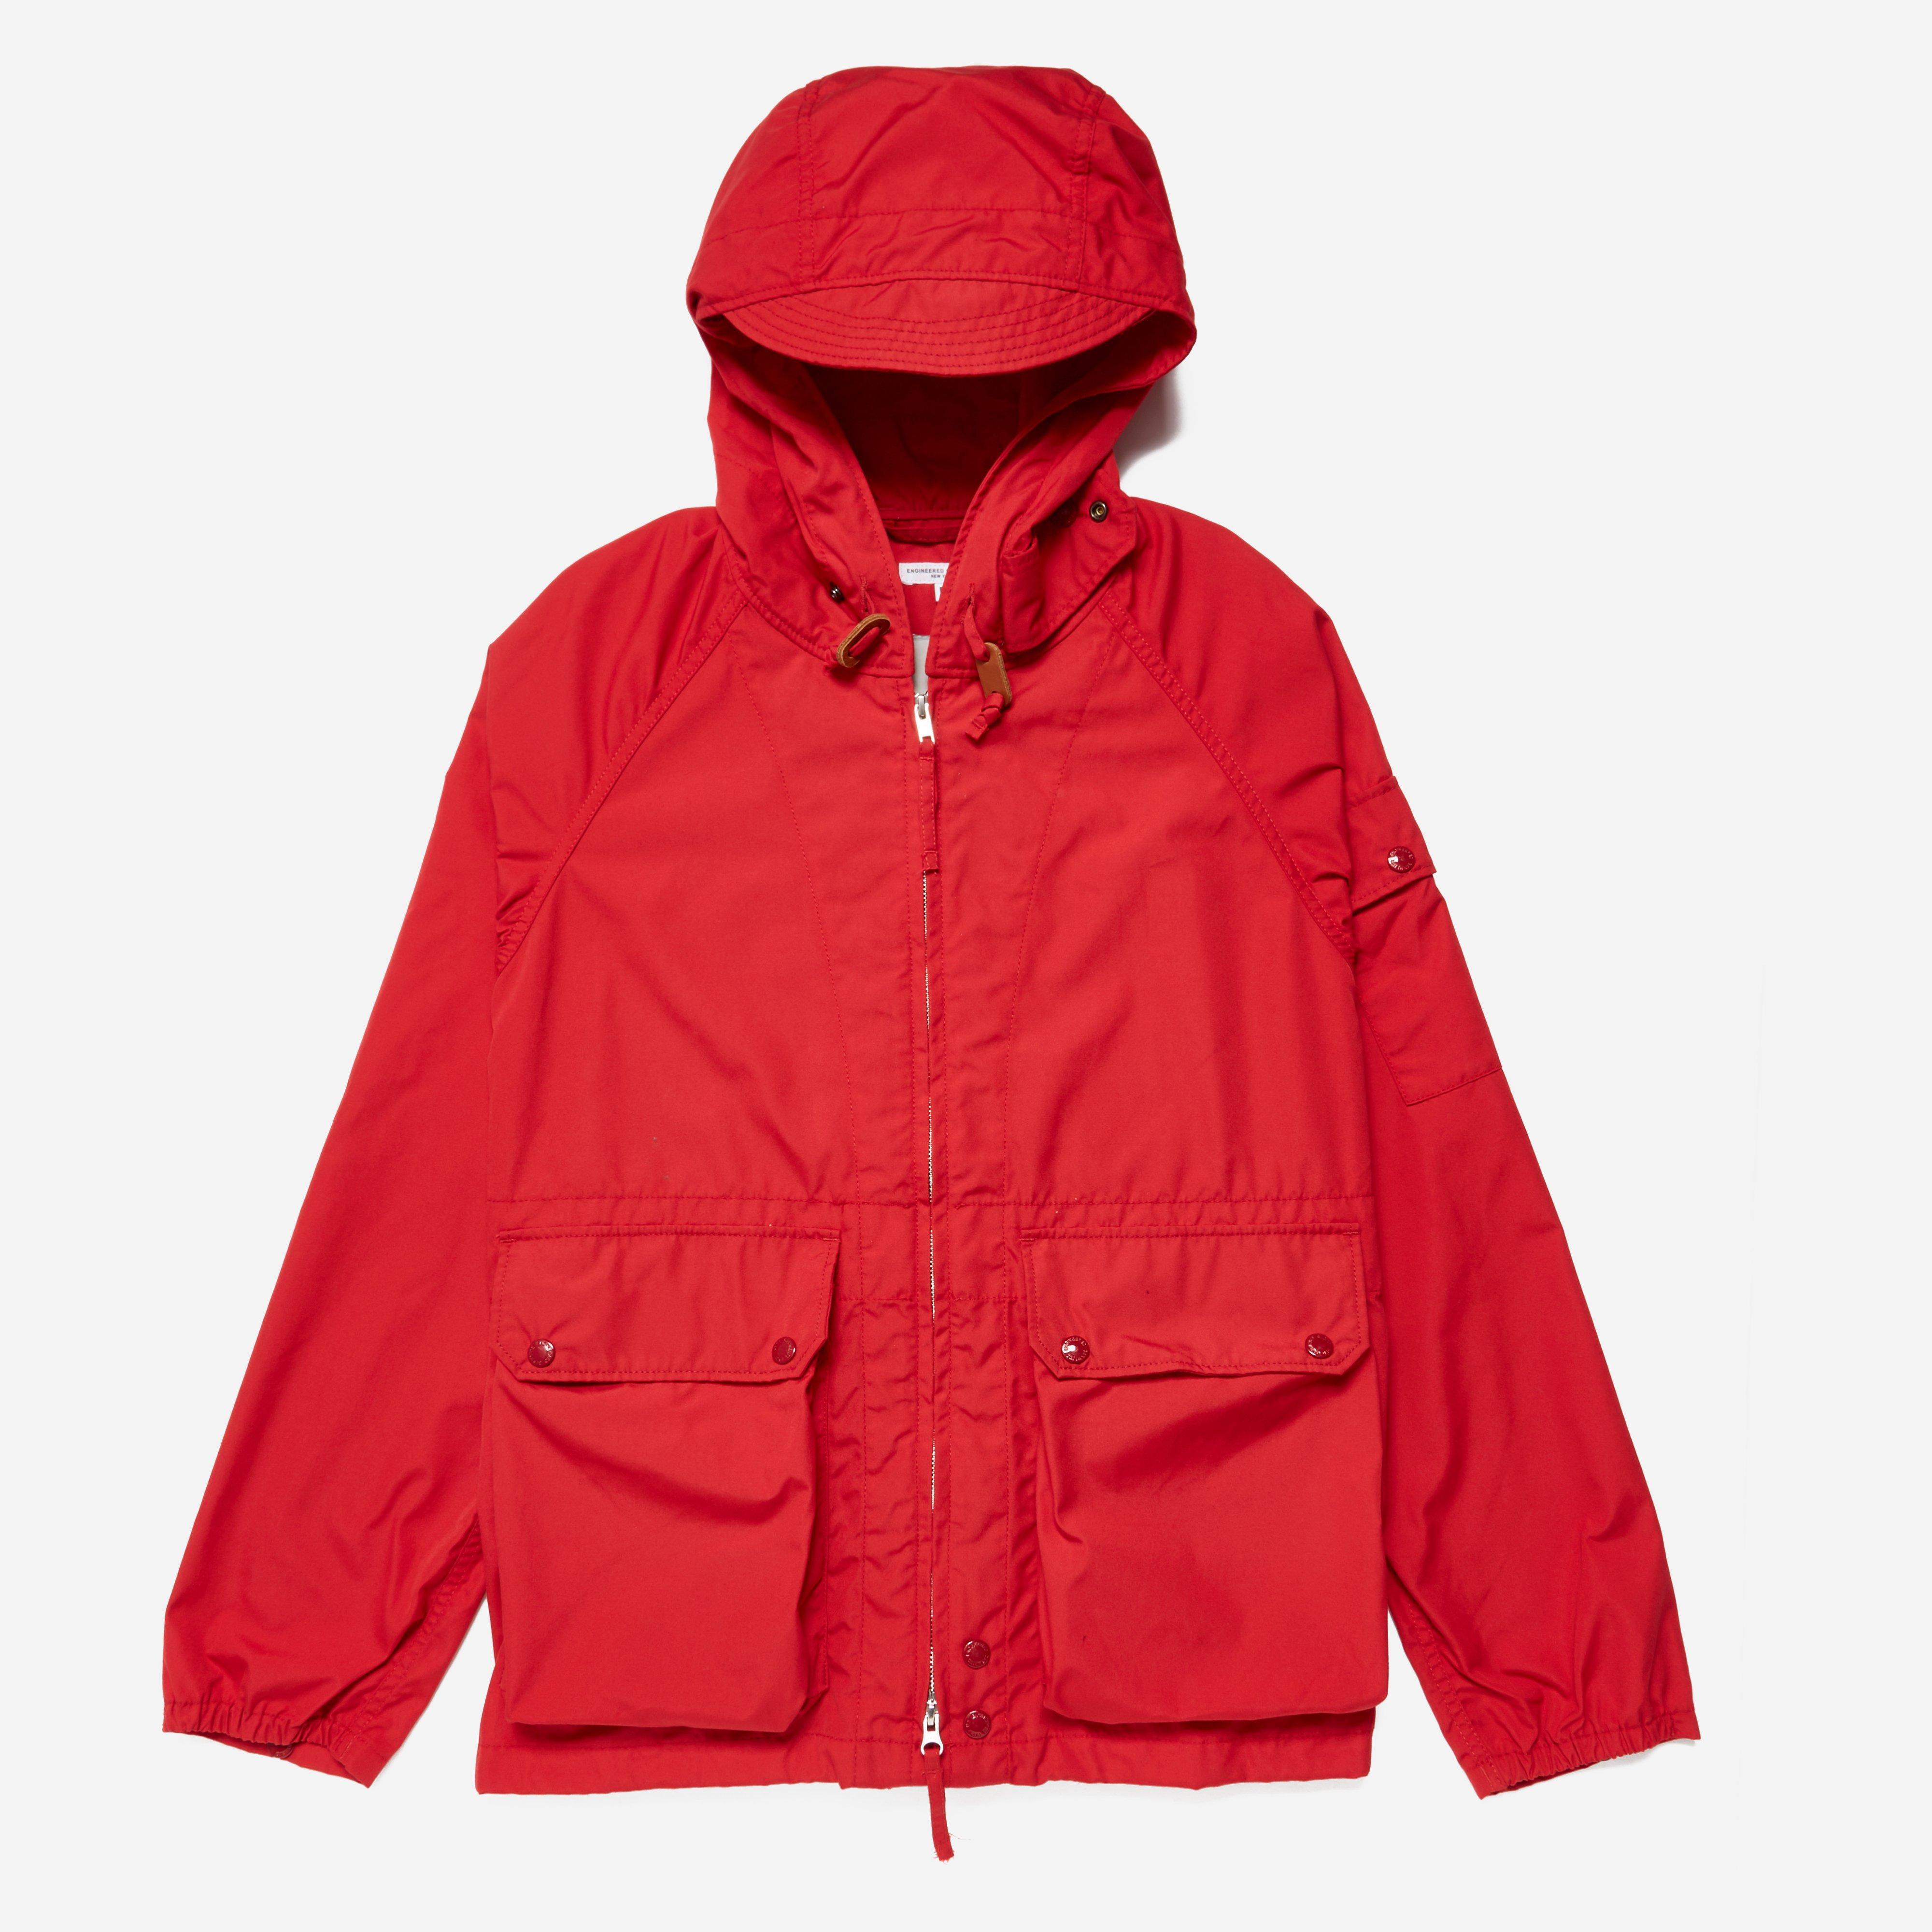 Engineered Garments Atlantic Parka